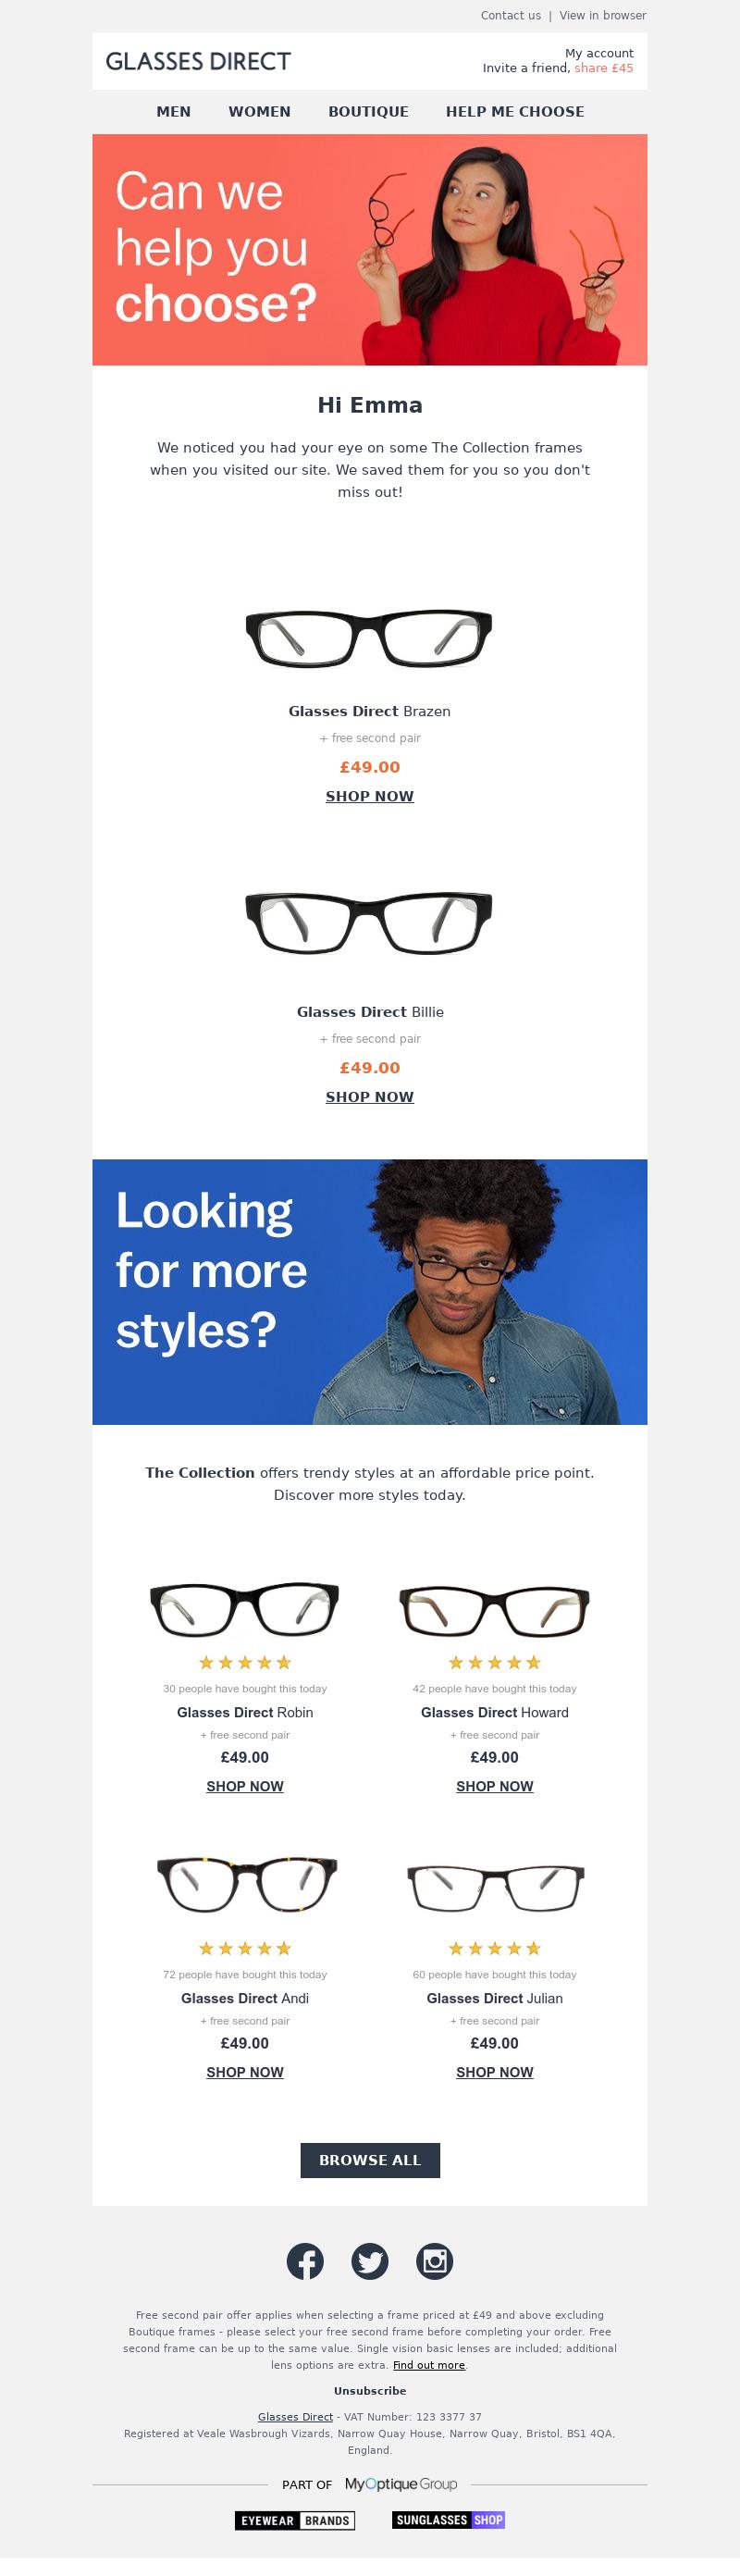 Glasses Direct (UK) - Having trouble choosing?